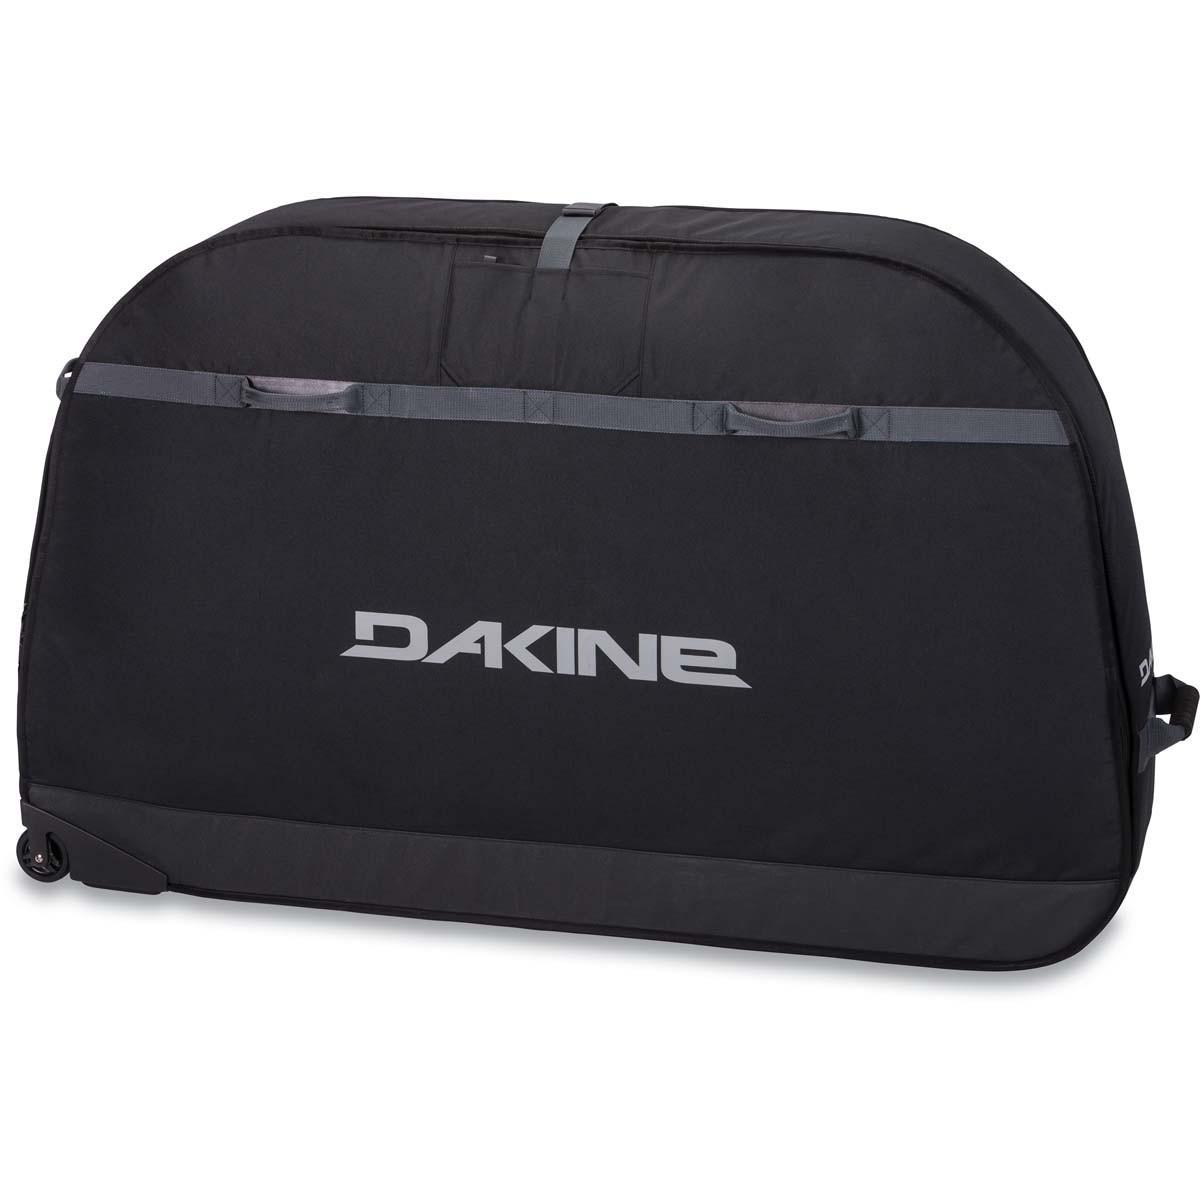 Dakine Bike Roller Bag Bag Black  dab6630f2b564